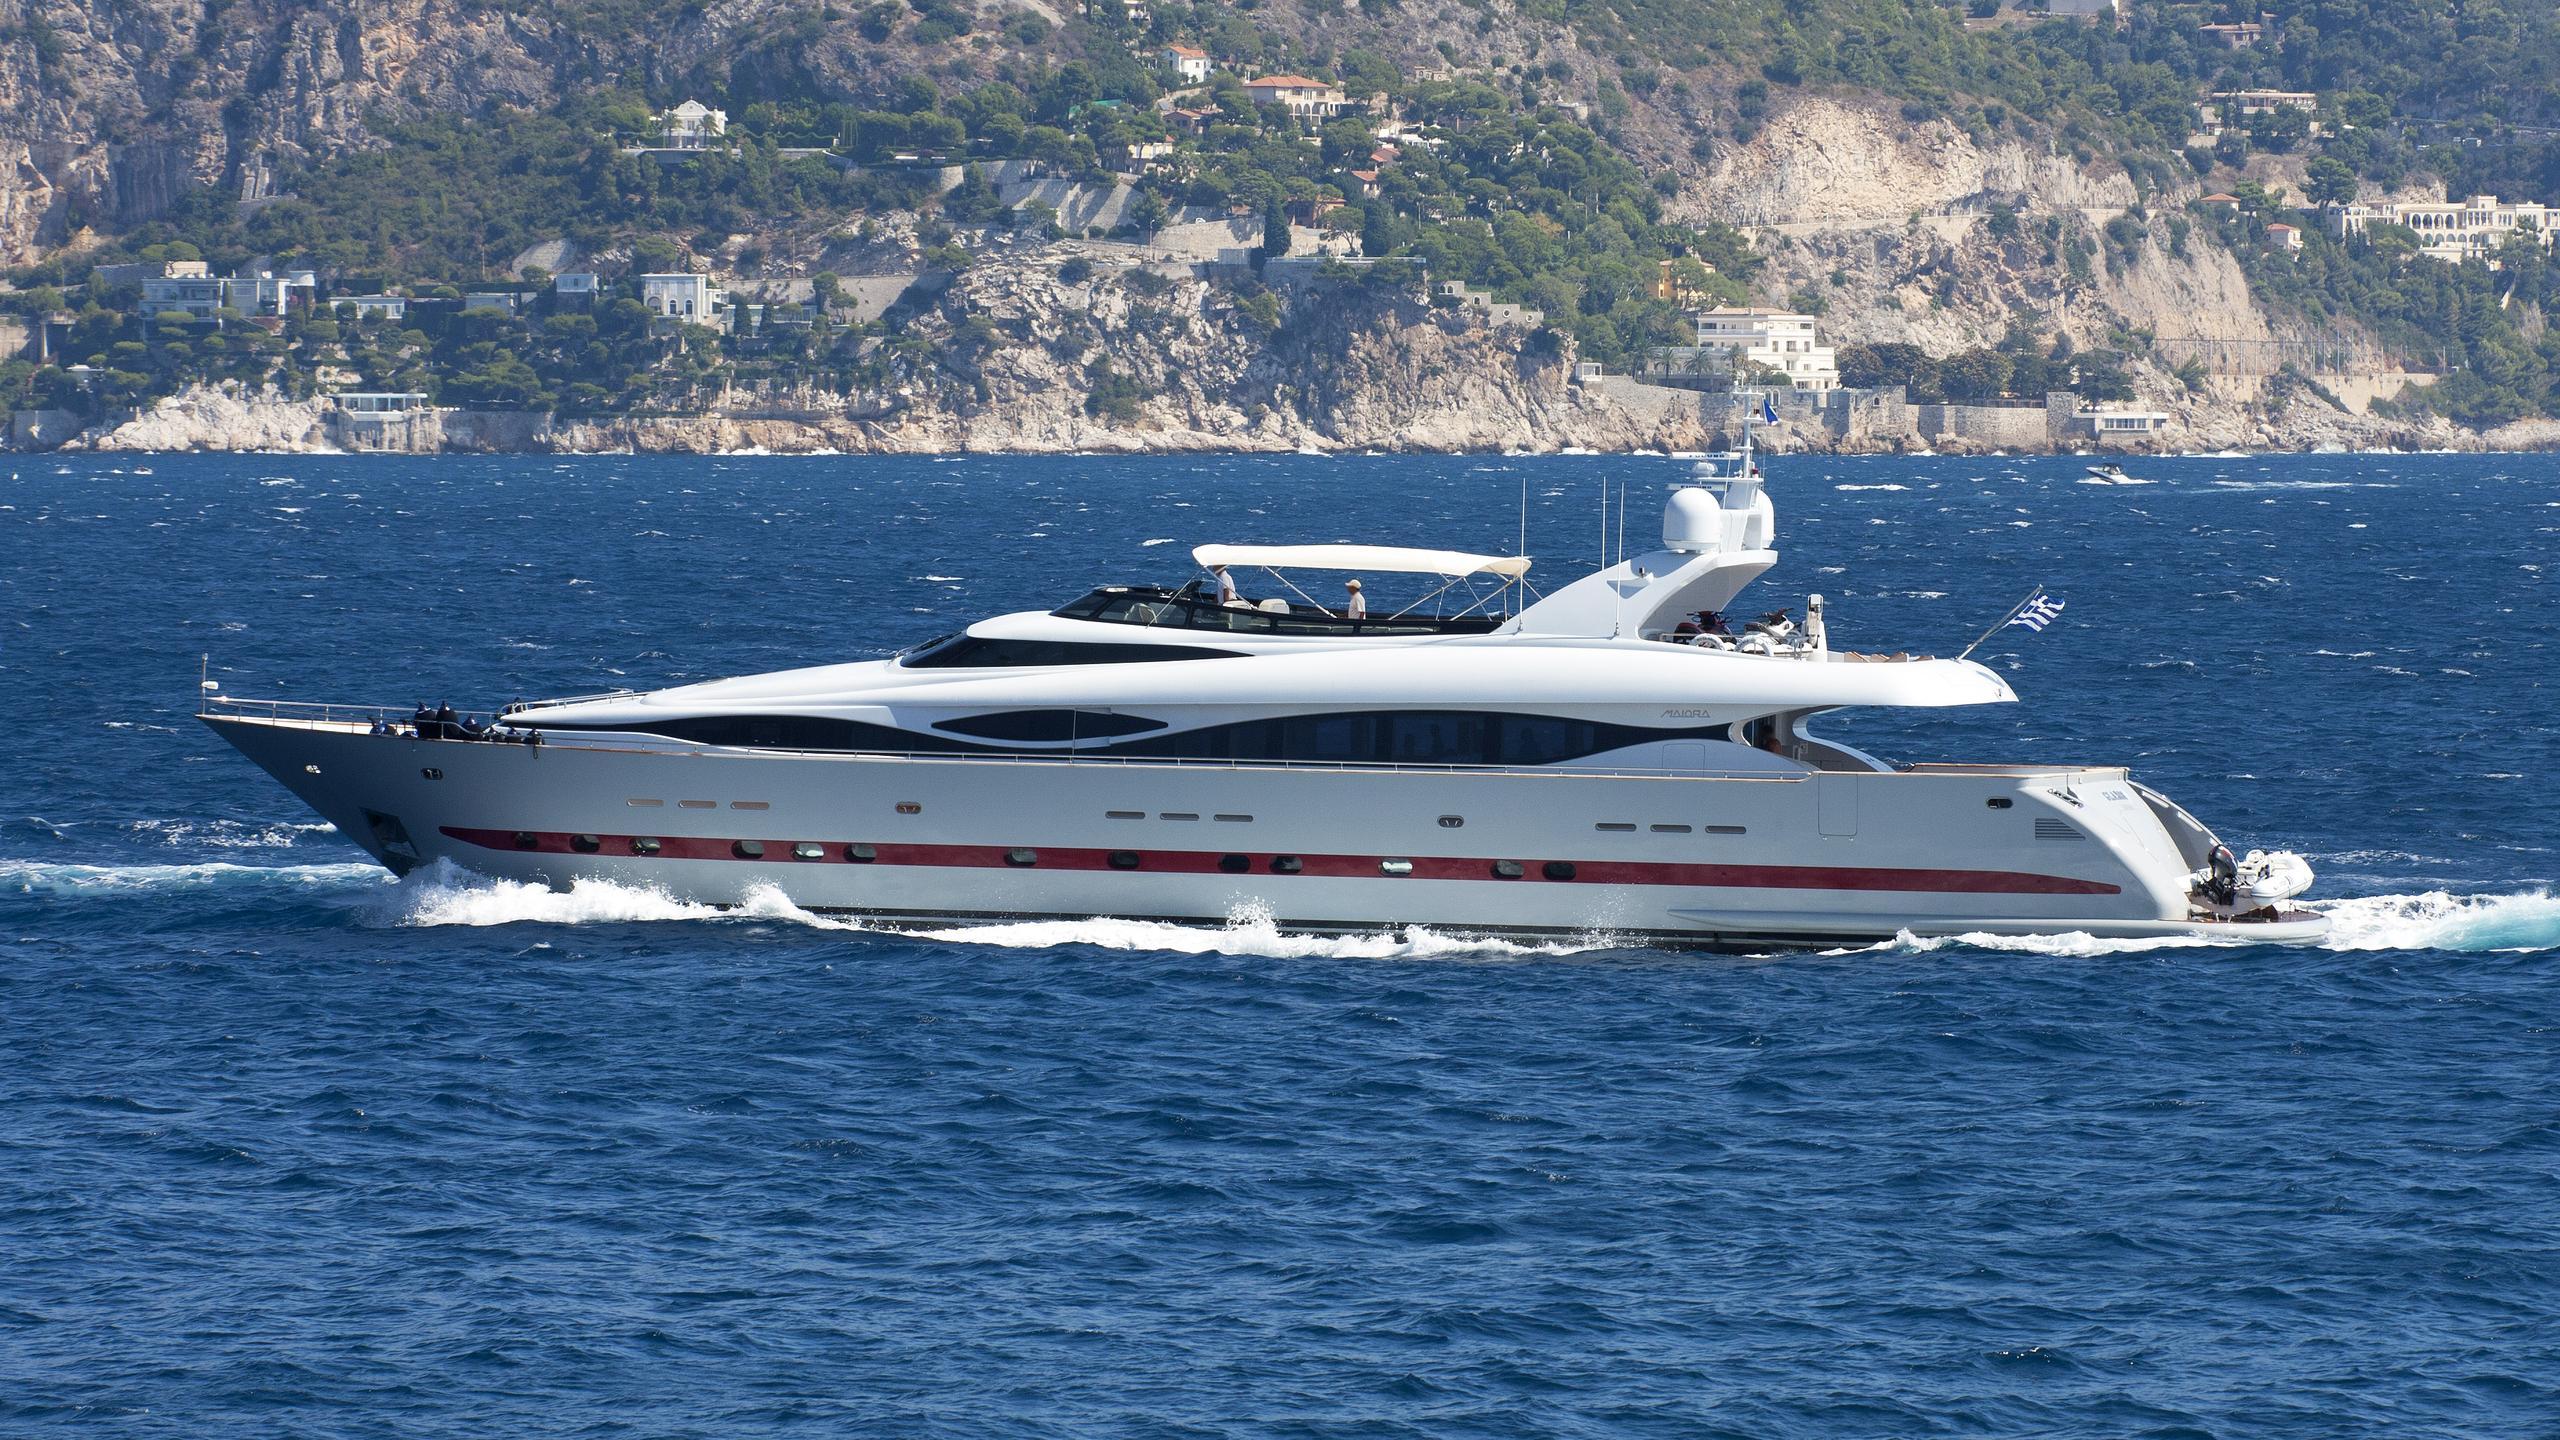 glaros-motor-yacht-maiora-38dp-2006-38m-profile